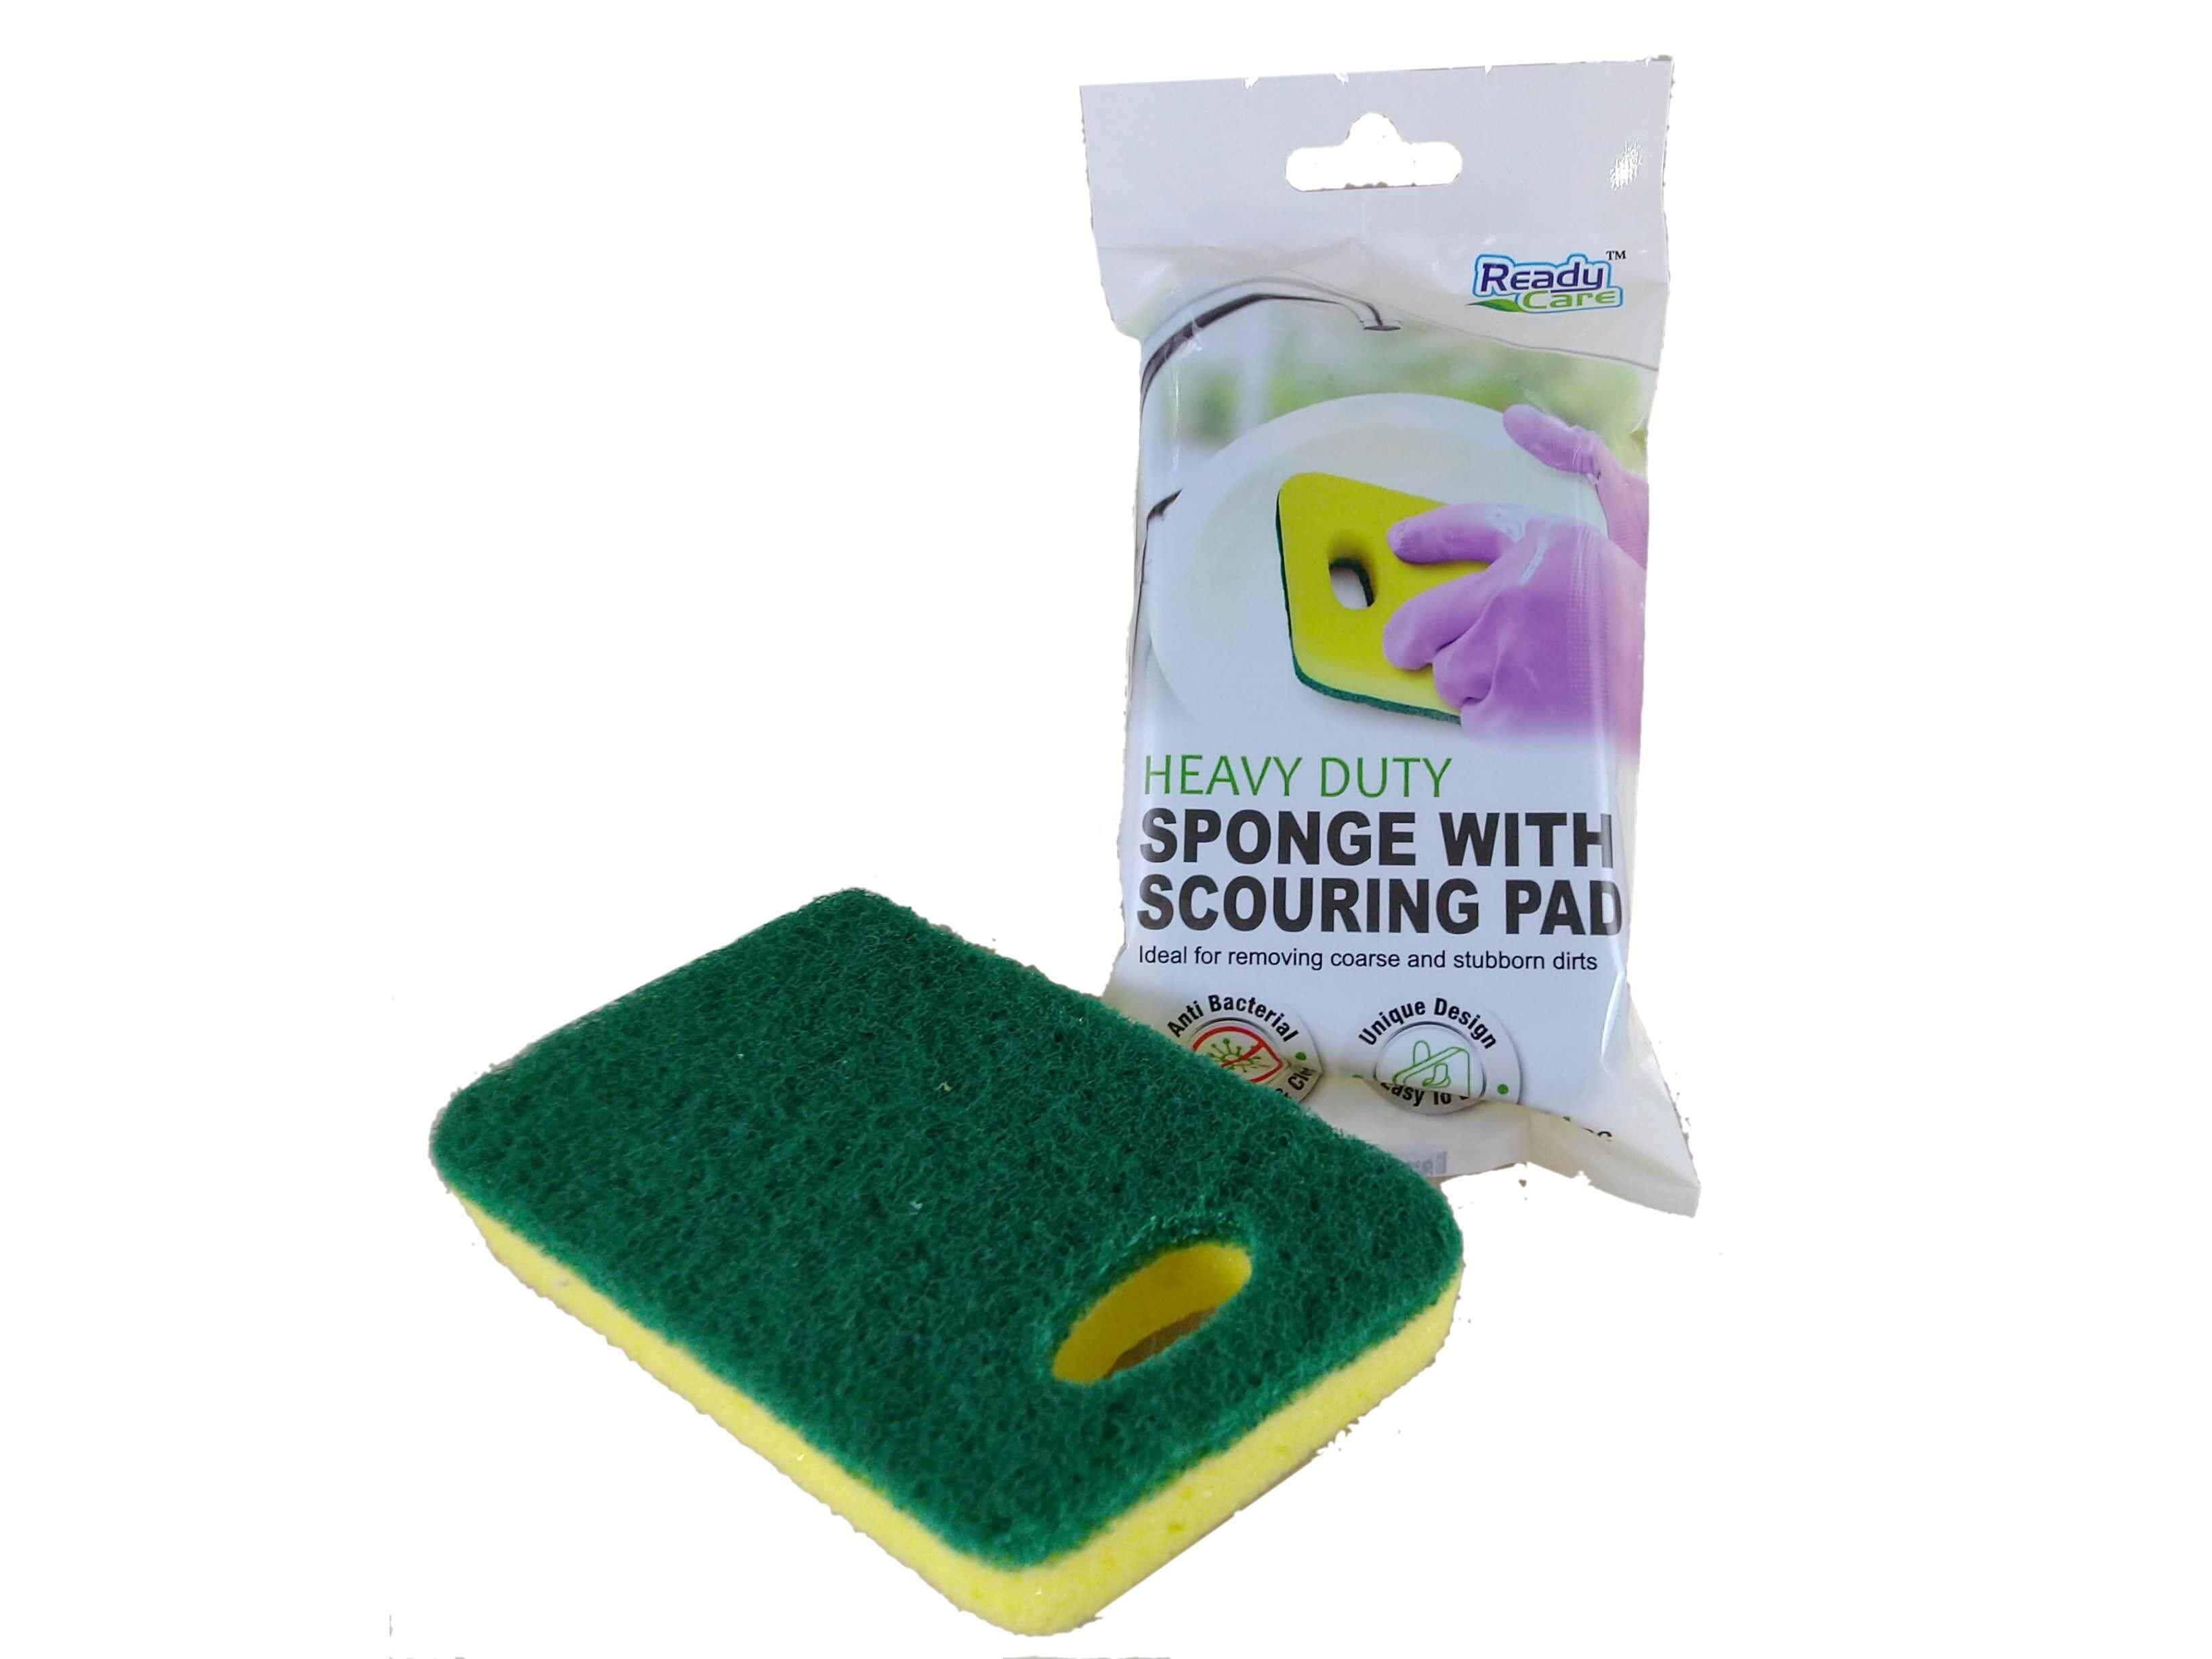 Readycare Sponge With Heavy Duty Scouring Pad 1pc